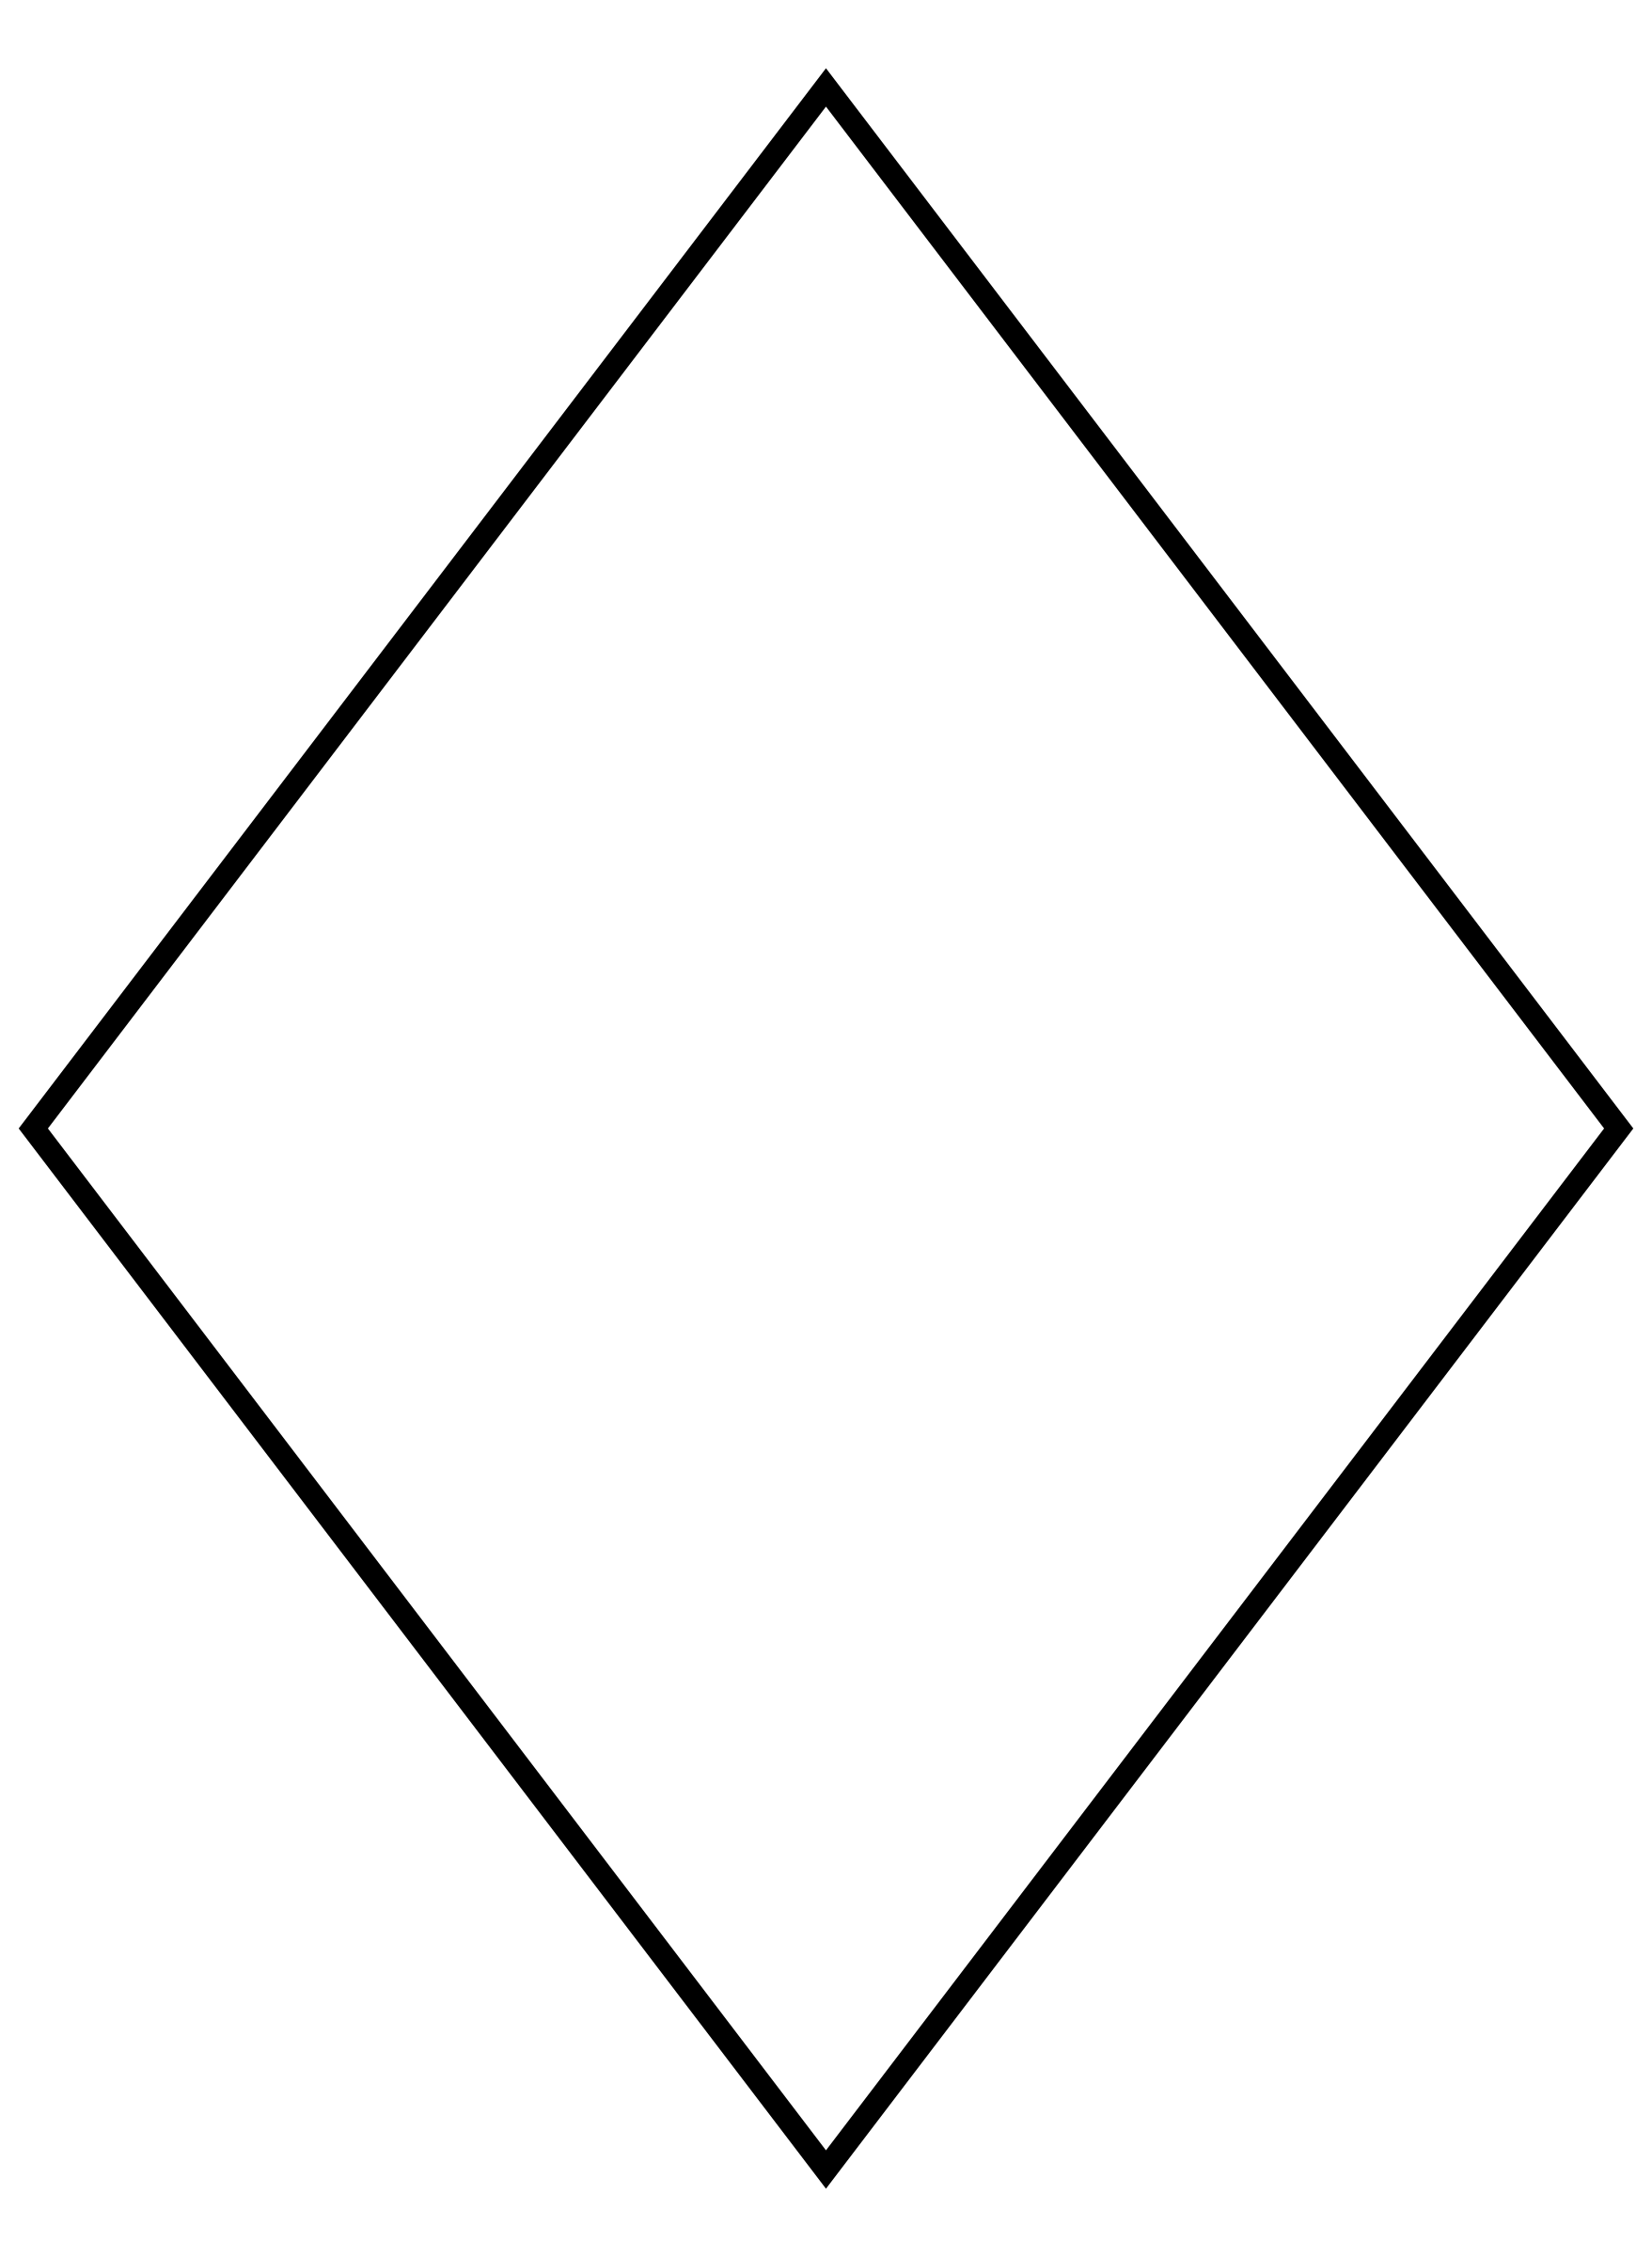 Clipart diamond diamond shape. Rhombus clip art png